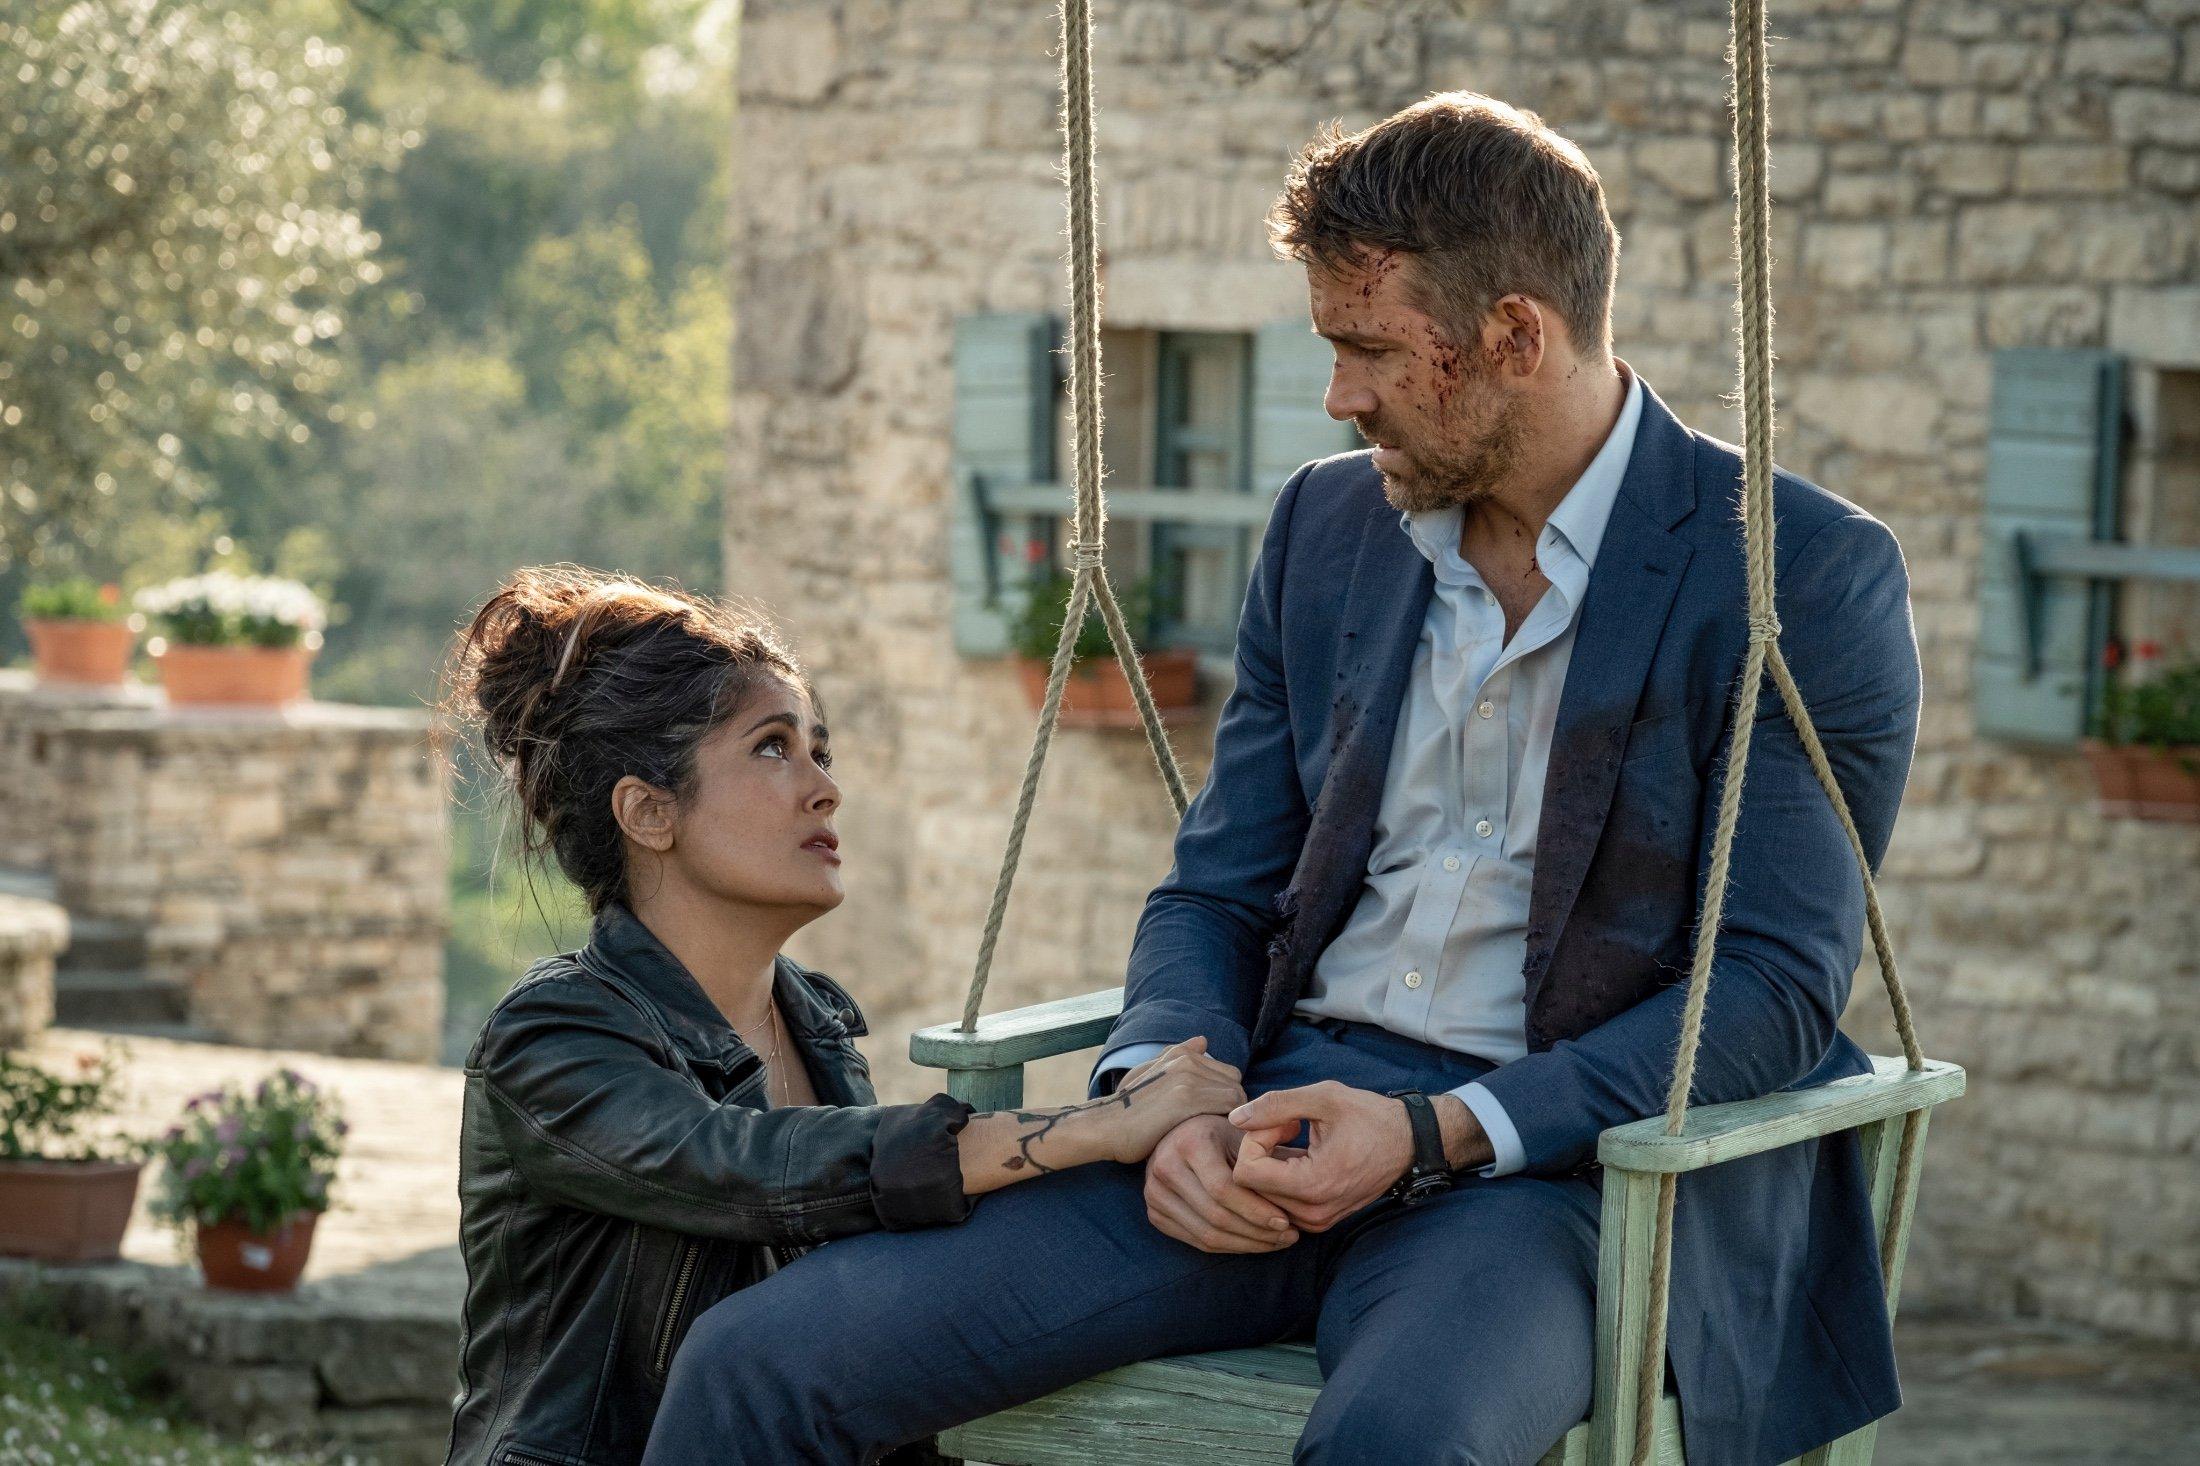 Salma Hayek (L) consolesRyan Reynolds, in a scene from the movie, 'The Hitman's Wife's Bodyguard.' (Lionsgate via AP)